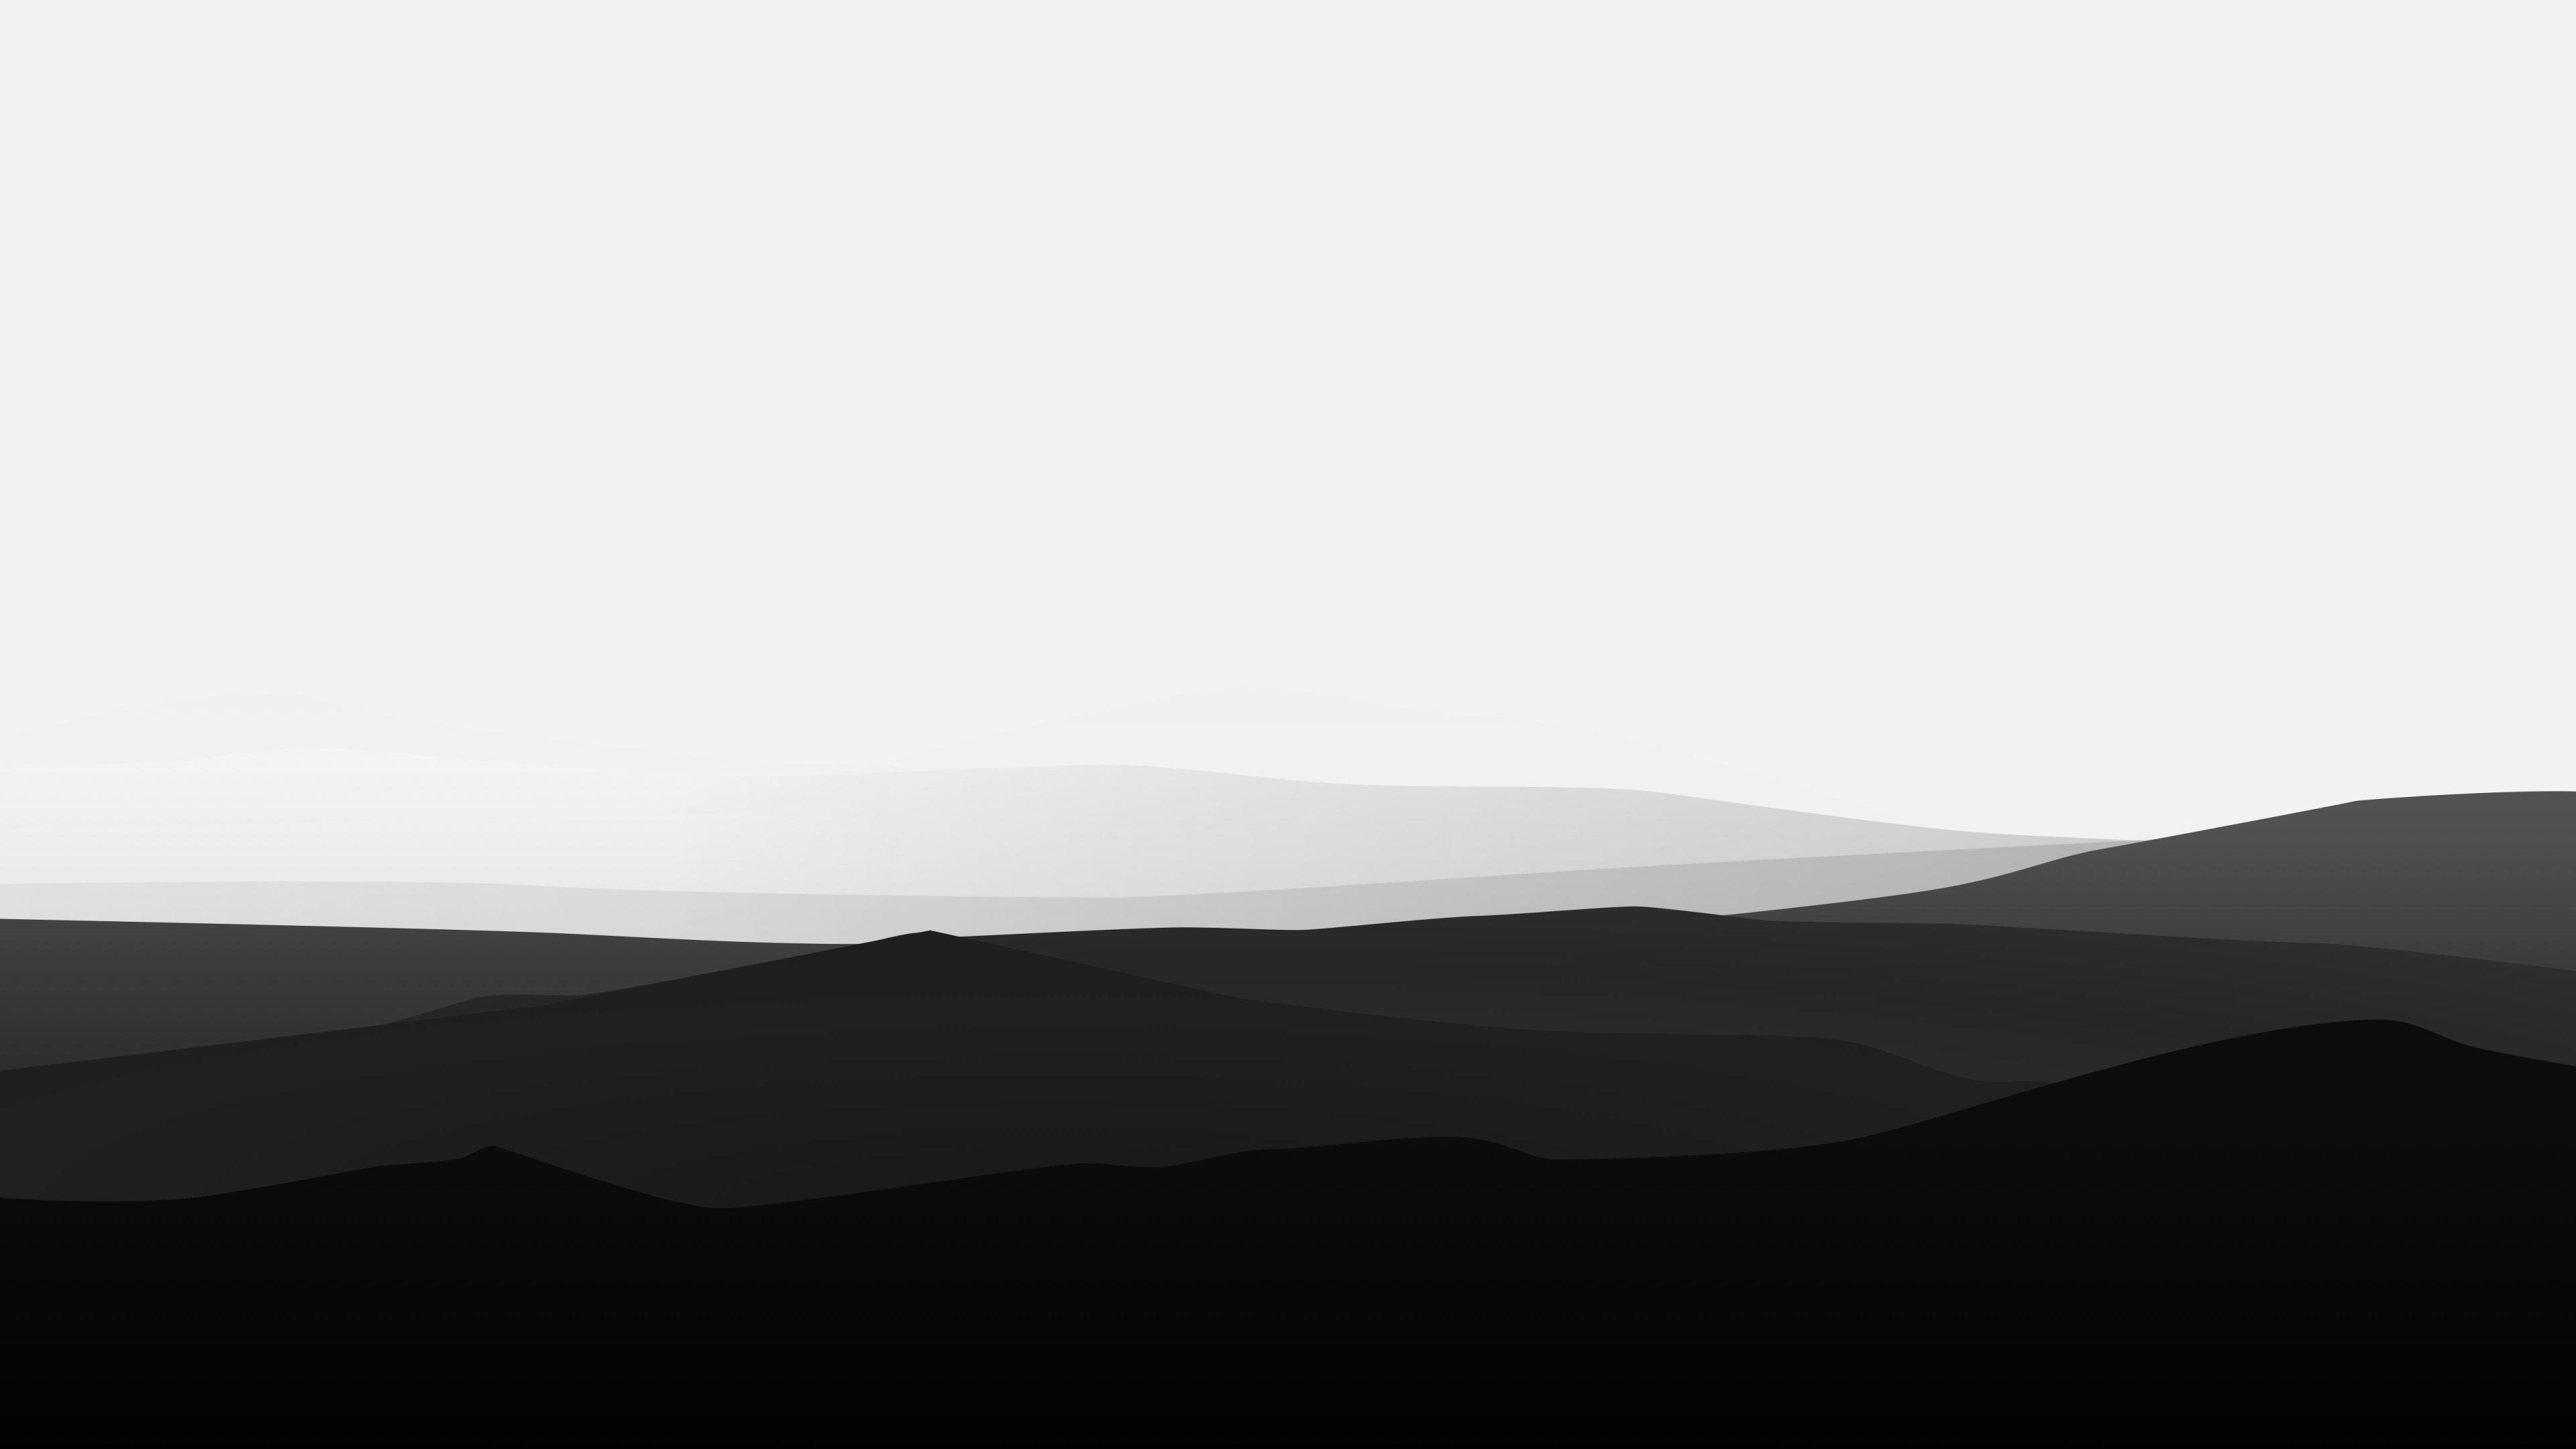 10 Beautiful 4k Wallpapers Dark Background Wallpaper Hd Dark Wallpapers Dark Wallpaper